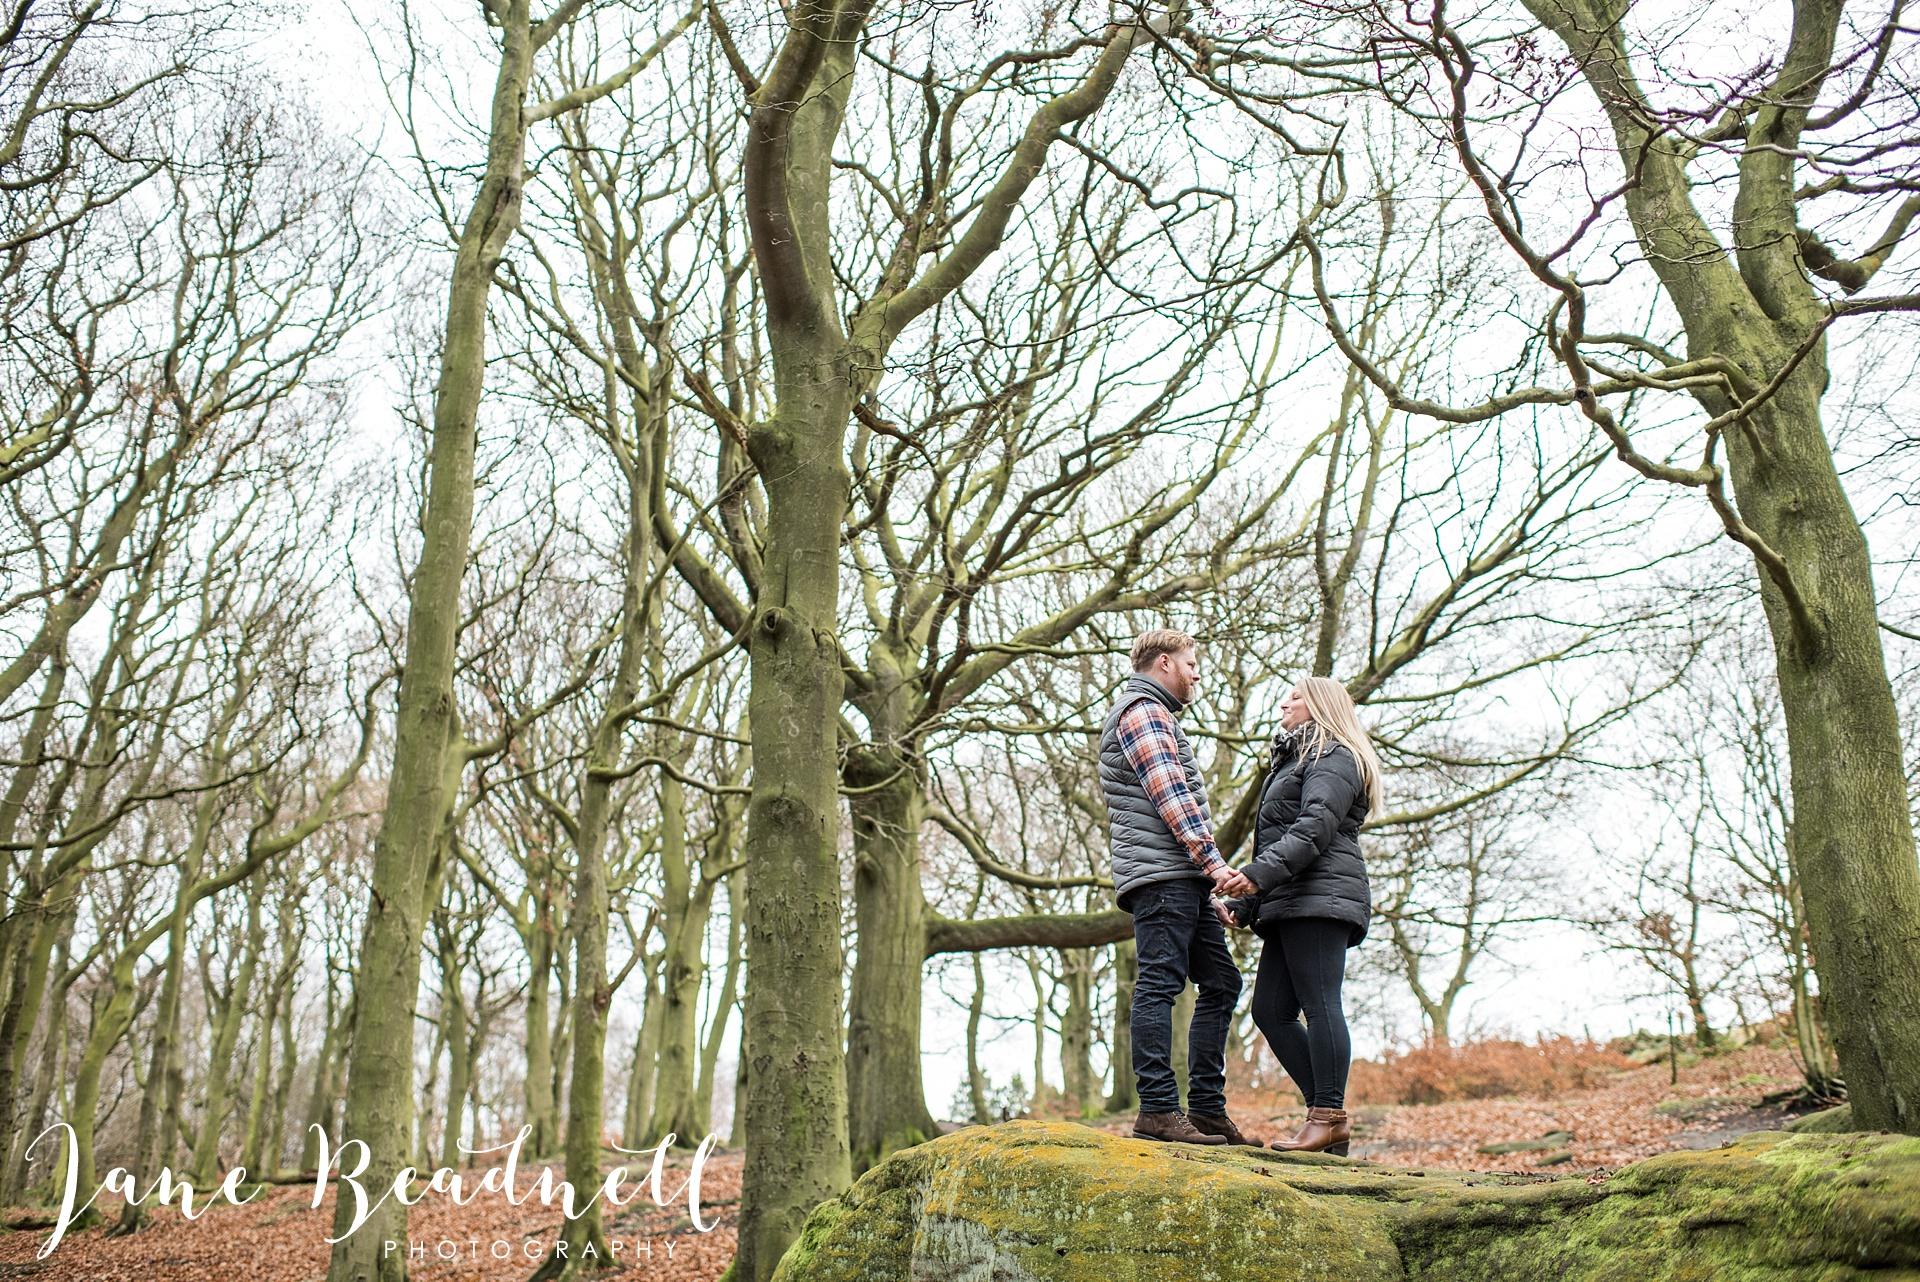 yorkshire-wedding-photographer-jane-beadnell-photography-uk-and-destination-wedding-photographer-engagement-shoot_0031